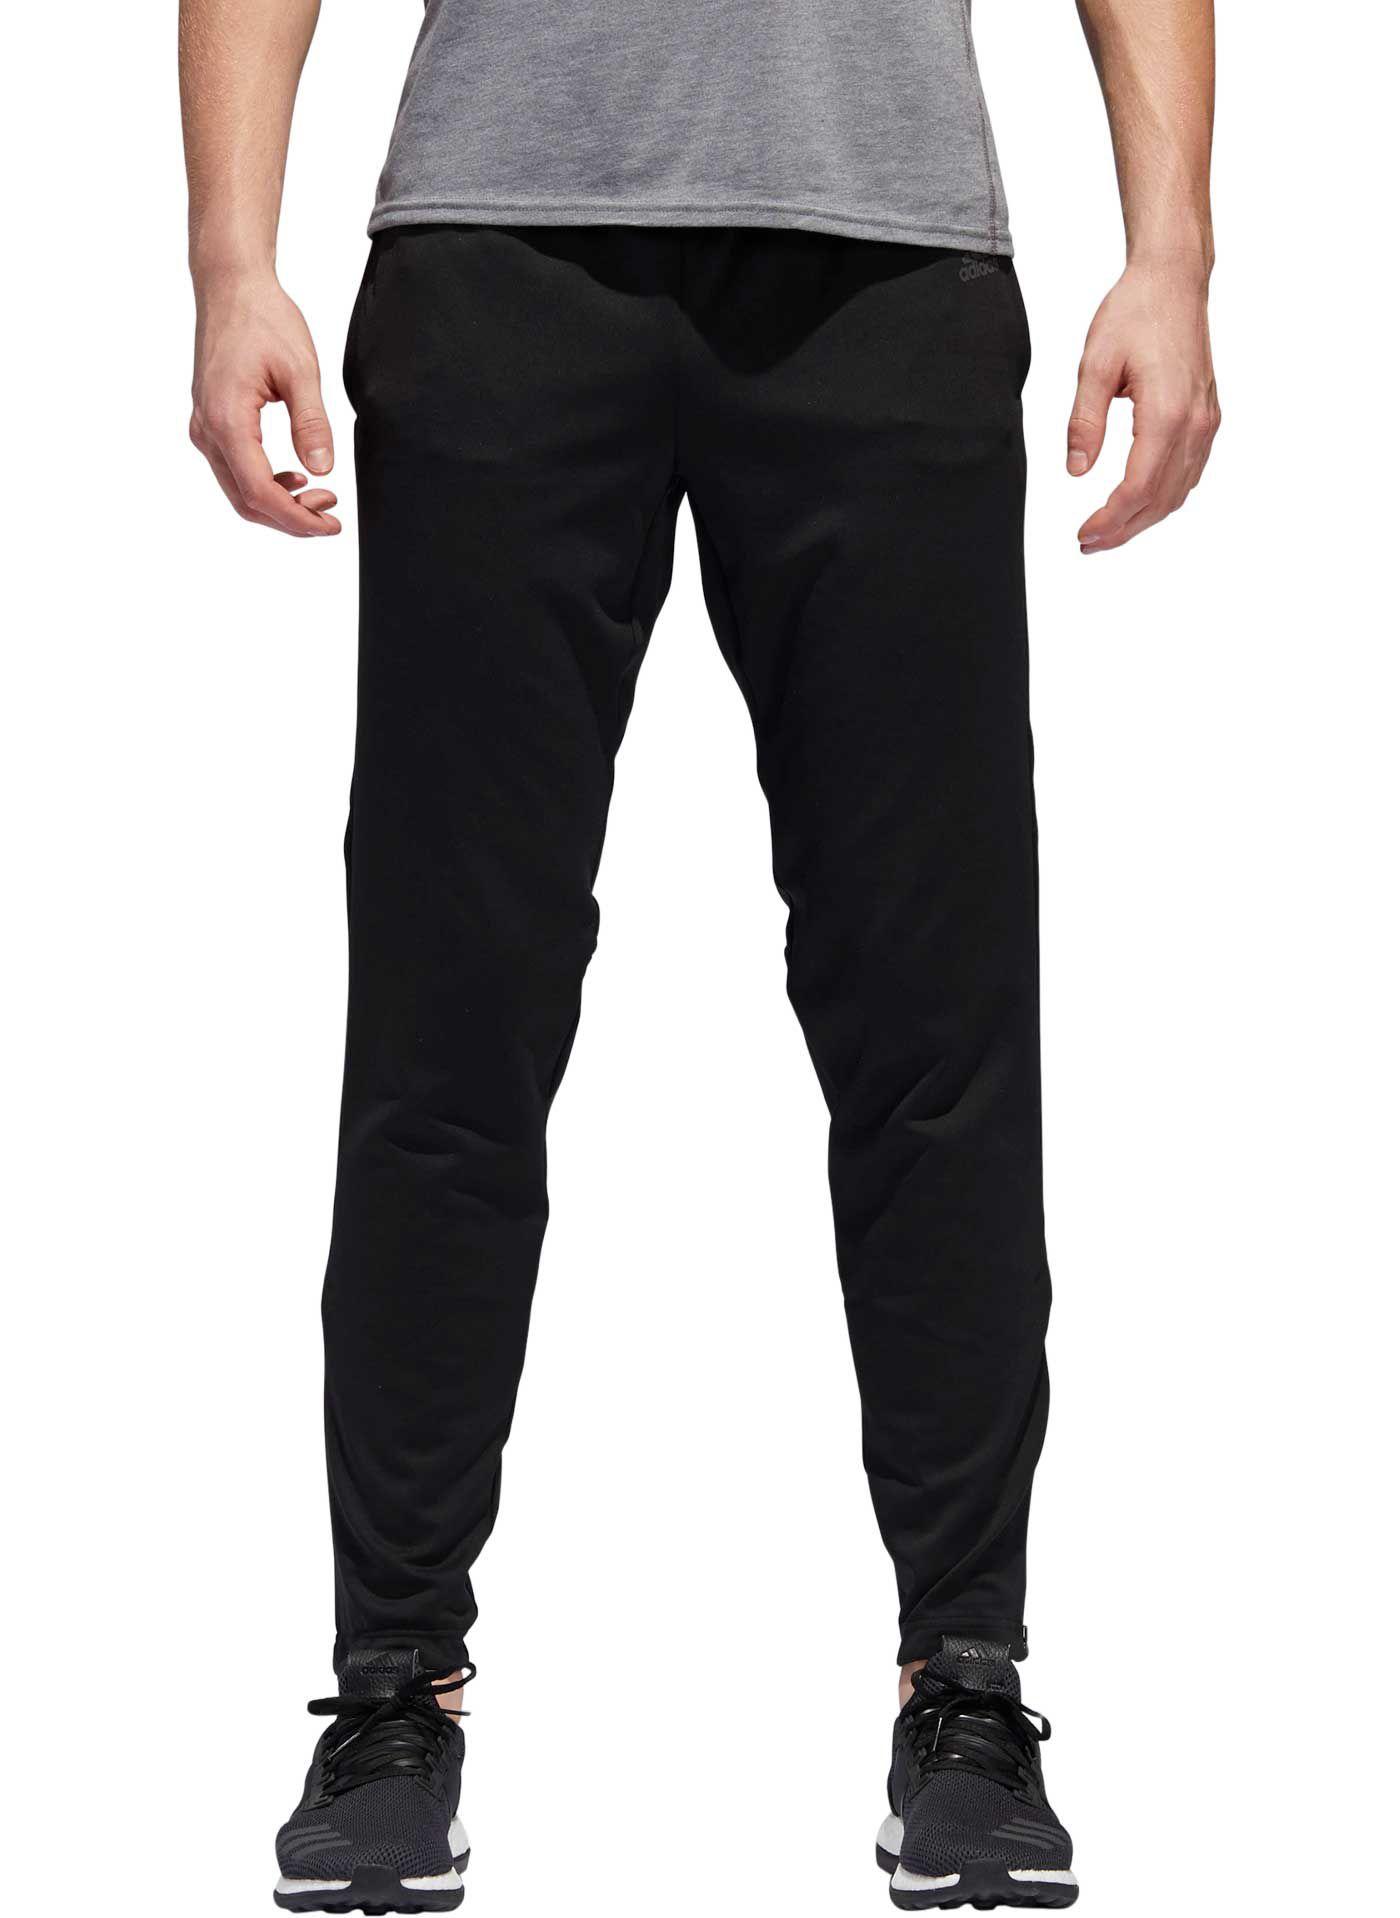 adidas Men's Response Astro Pants